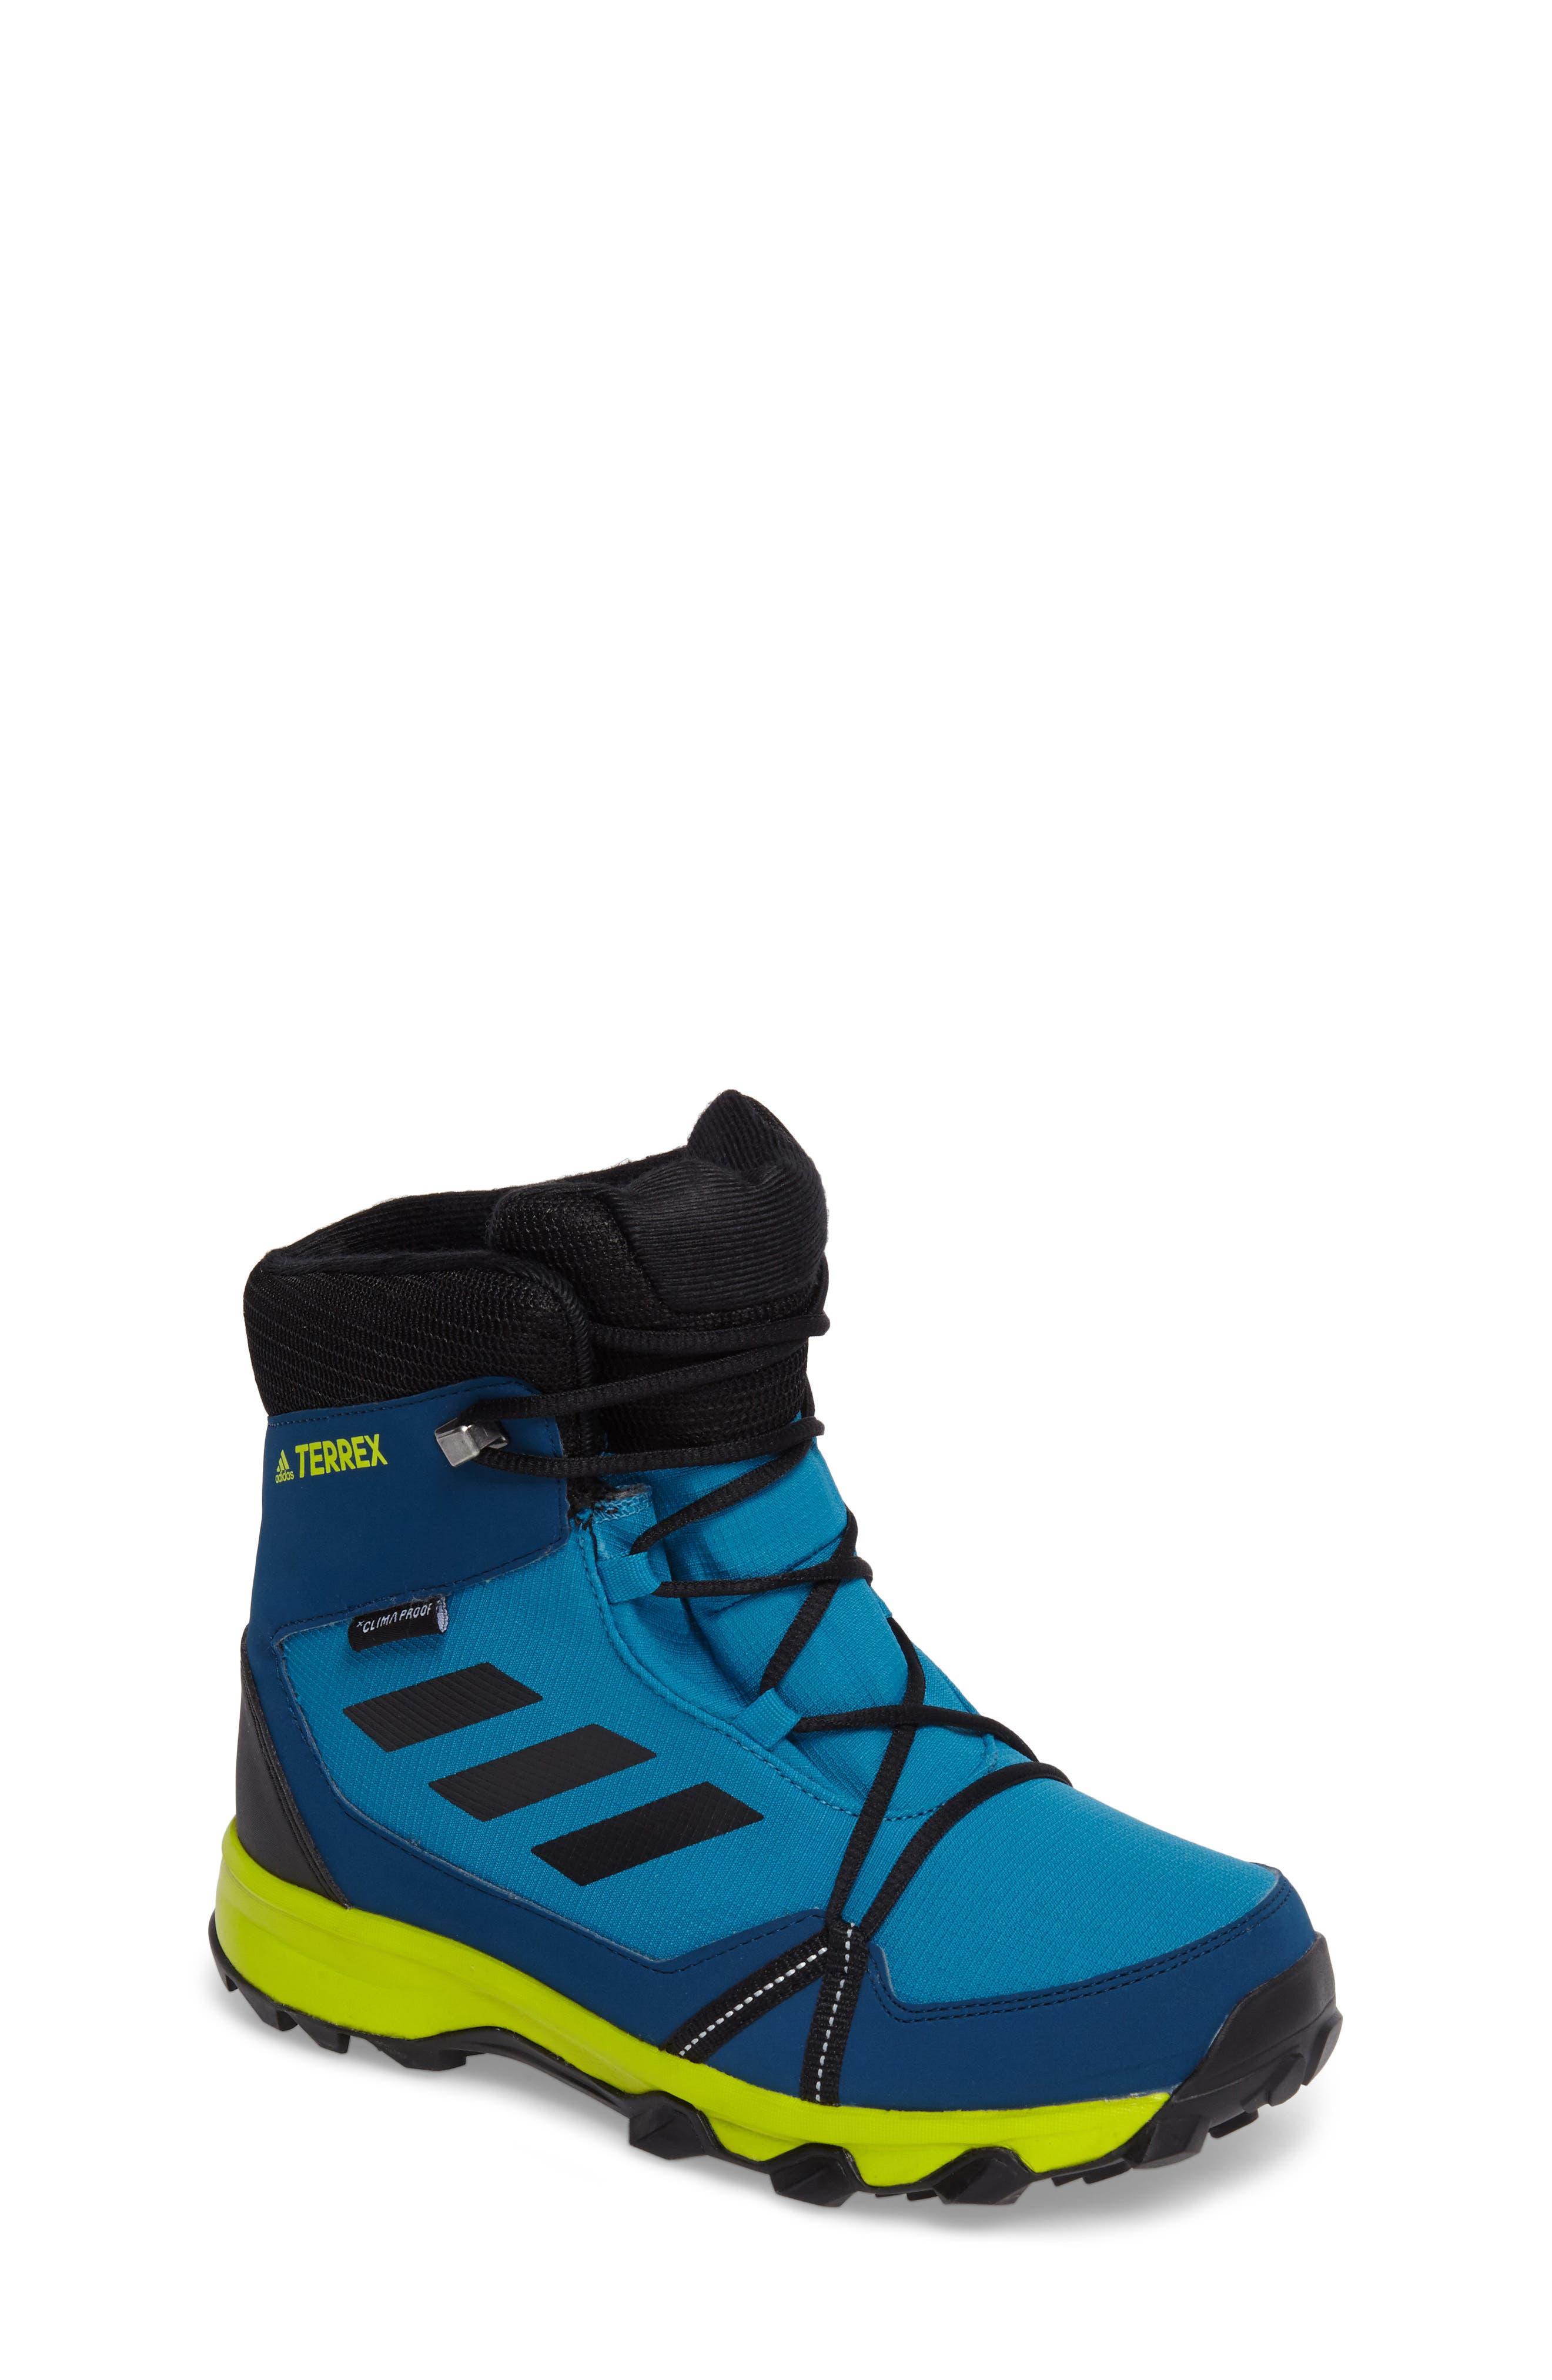 adidas Terrex Snow Sneaker Boot (Toddler, Little Kid & Big Kid)